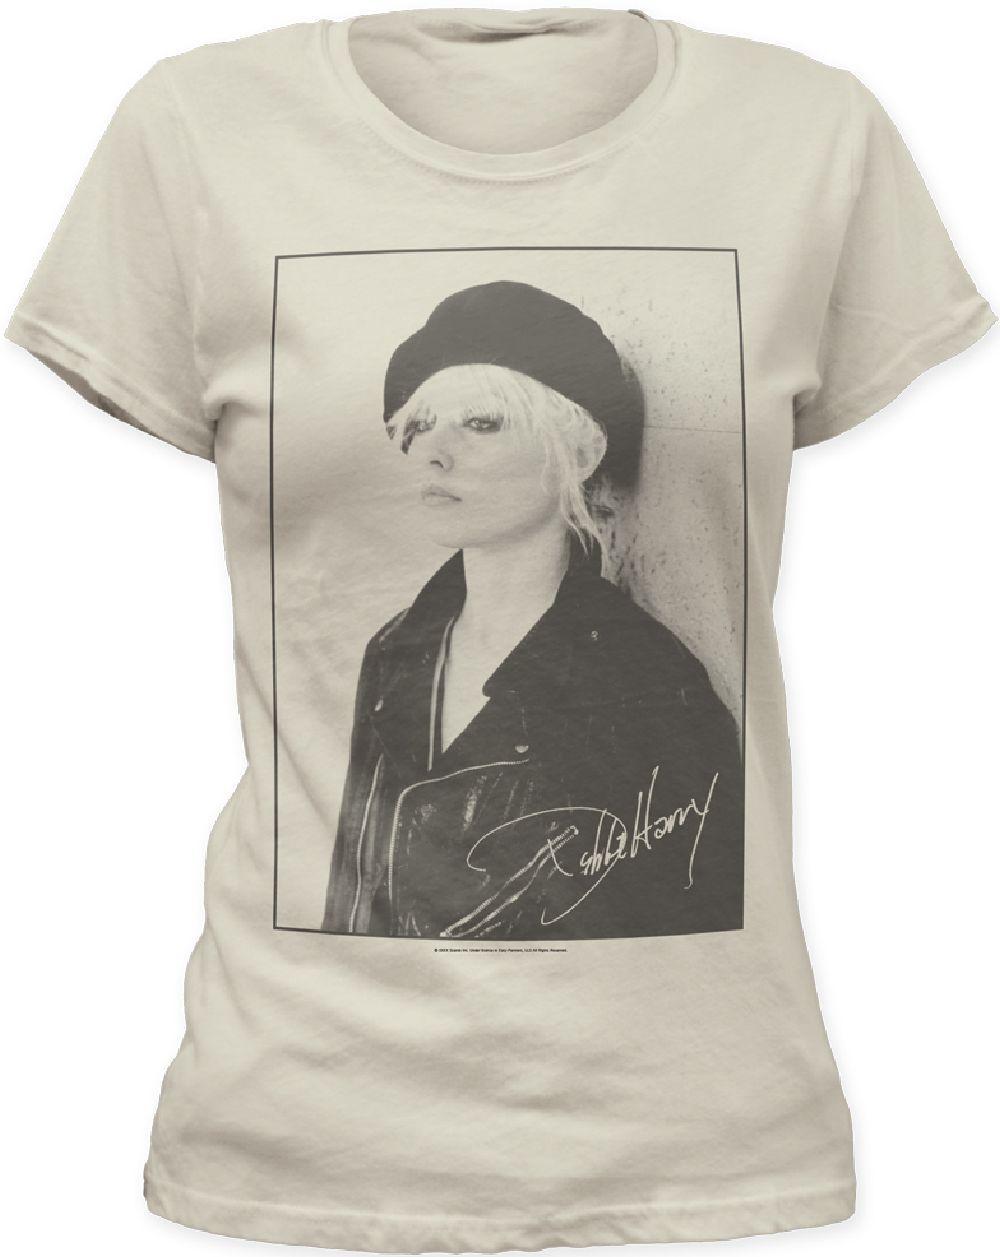 Blondie/'s Deborah Harry /& David Bowie T-Shirt//New Retro,Debbie Harry Merchandise